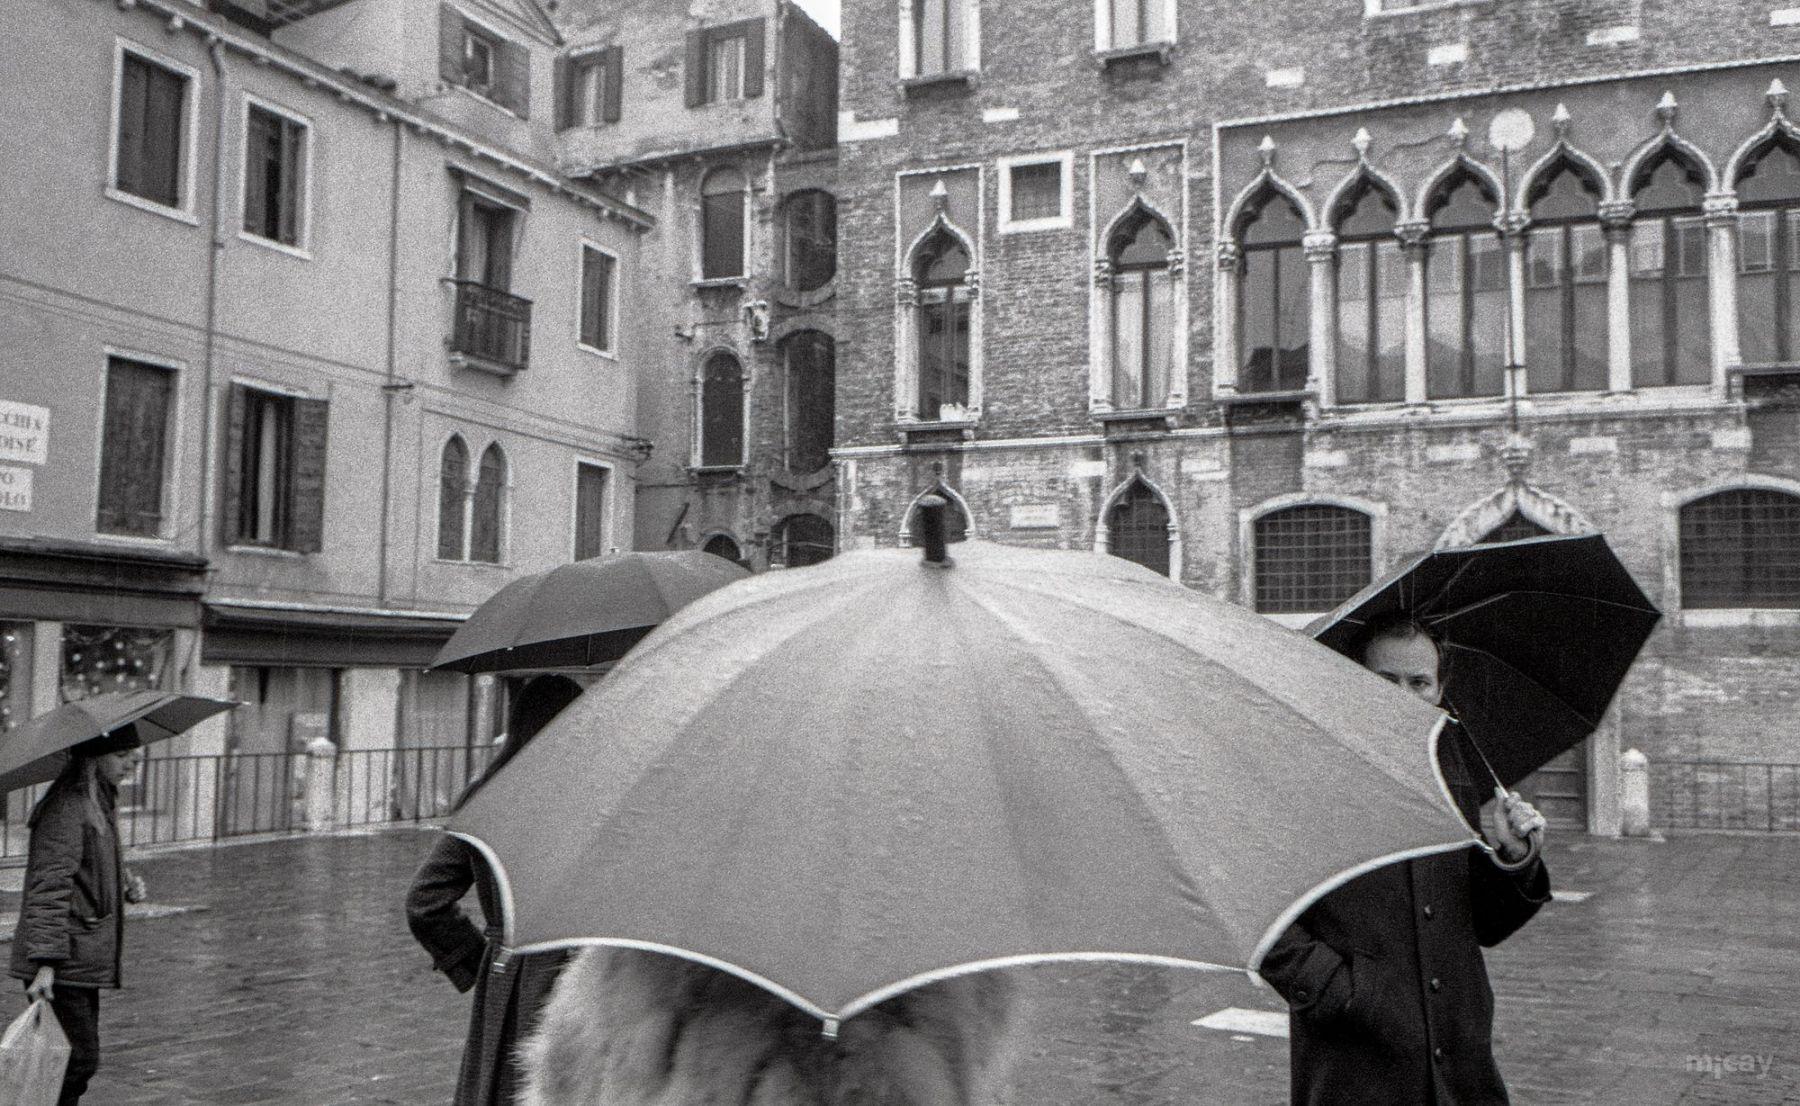 MichelAycaguer-Venise-AquaAlta-Noel-1981-30